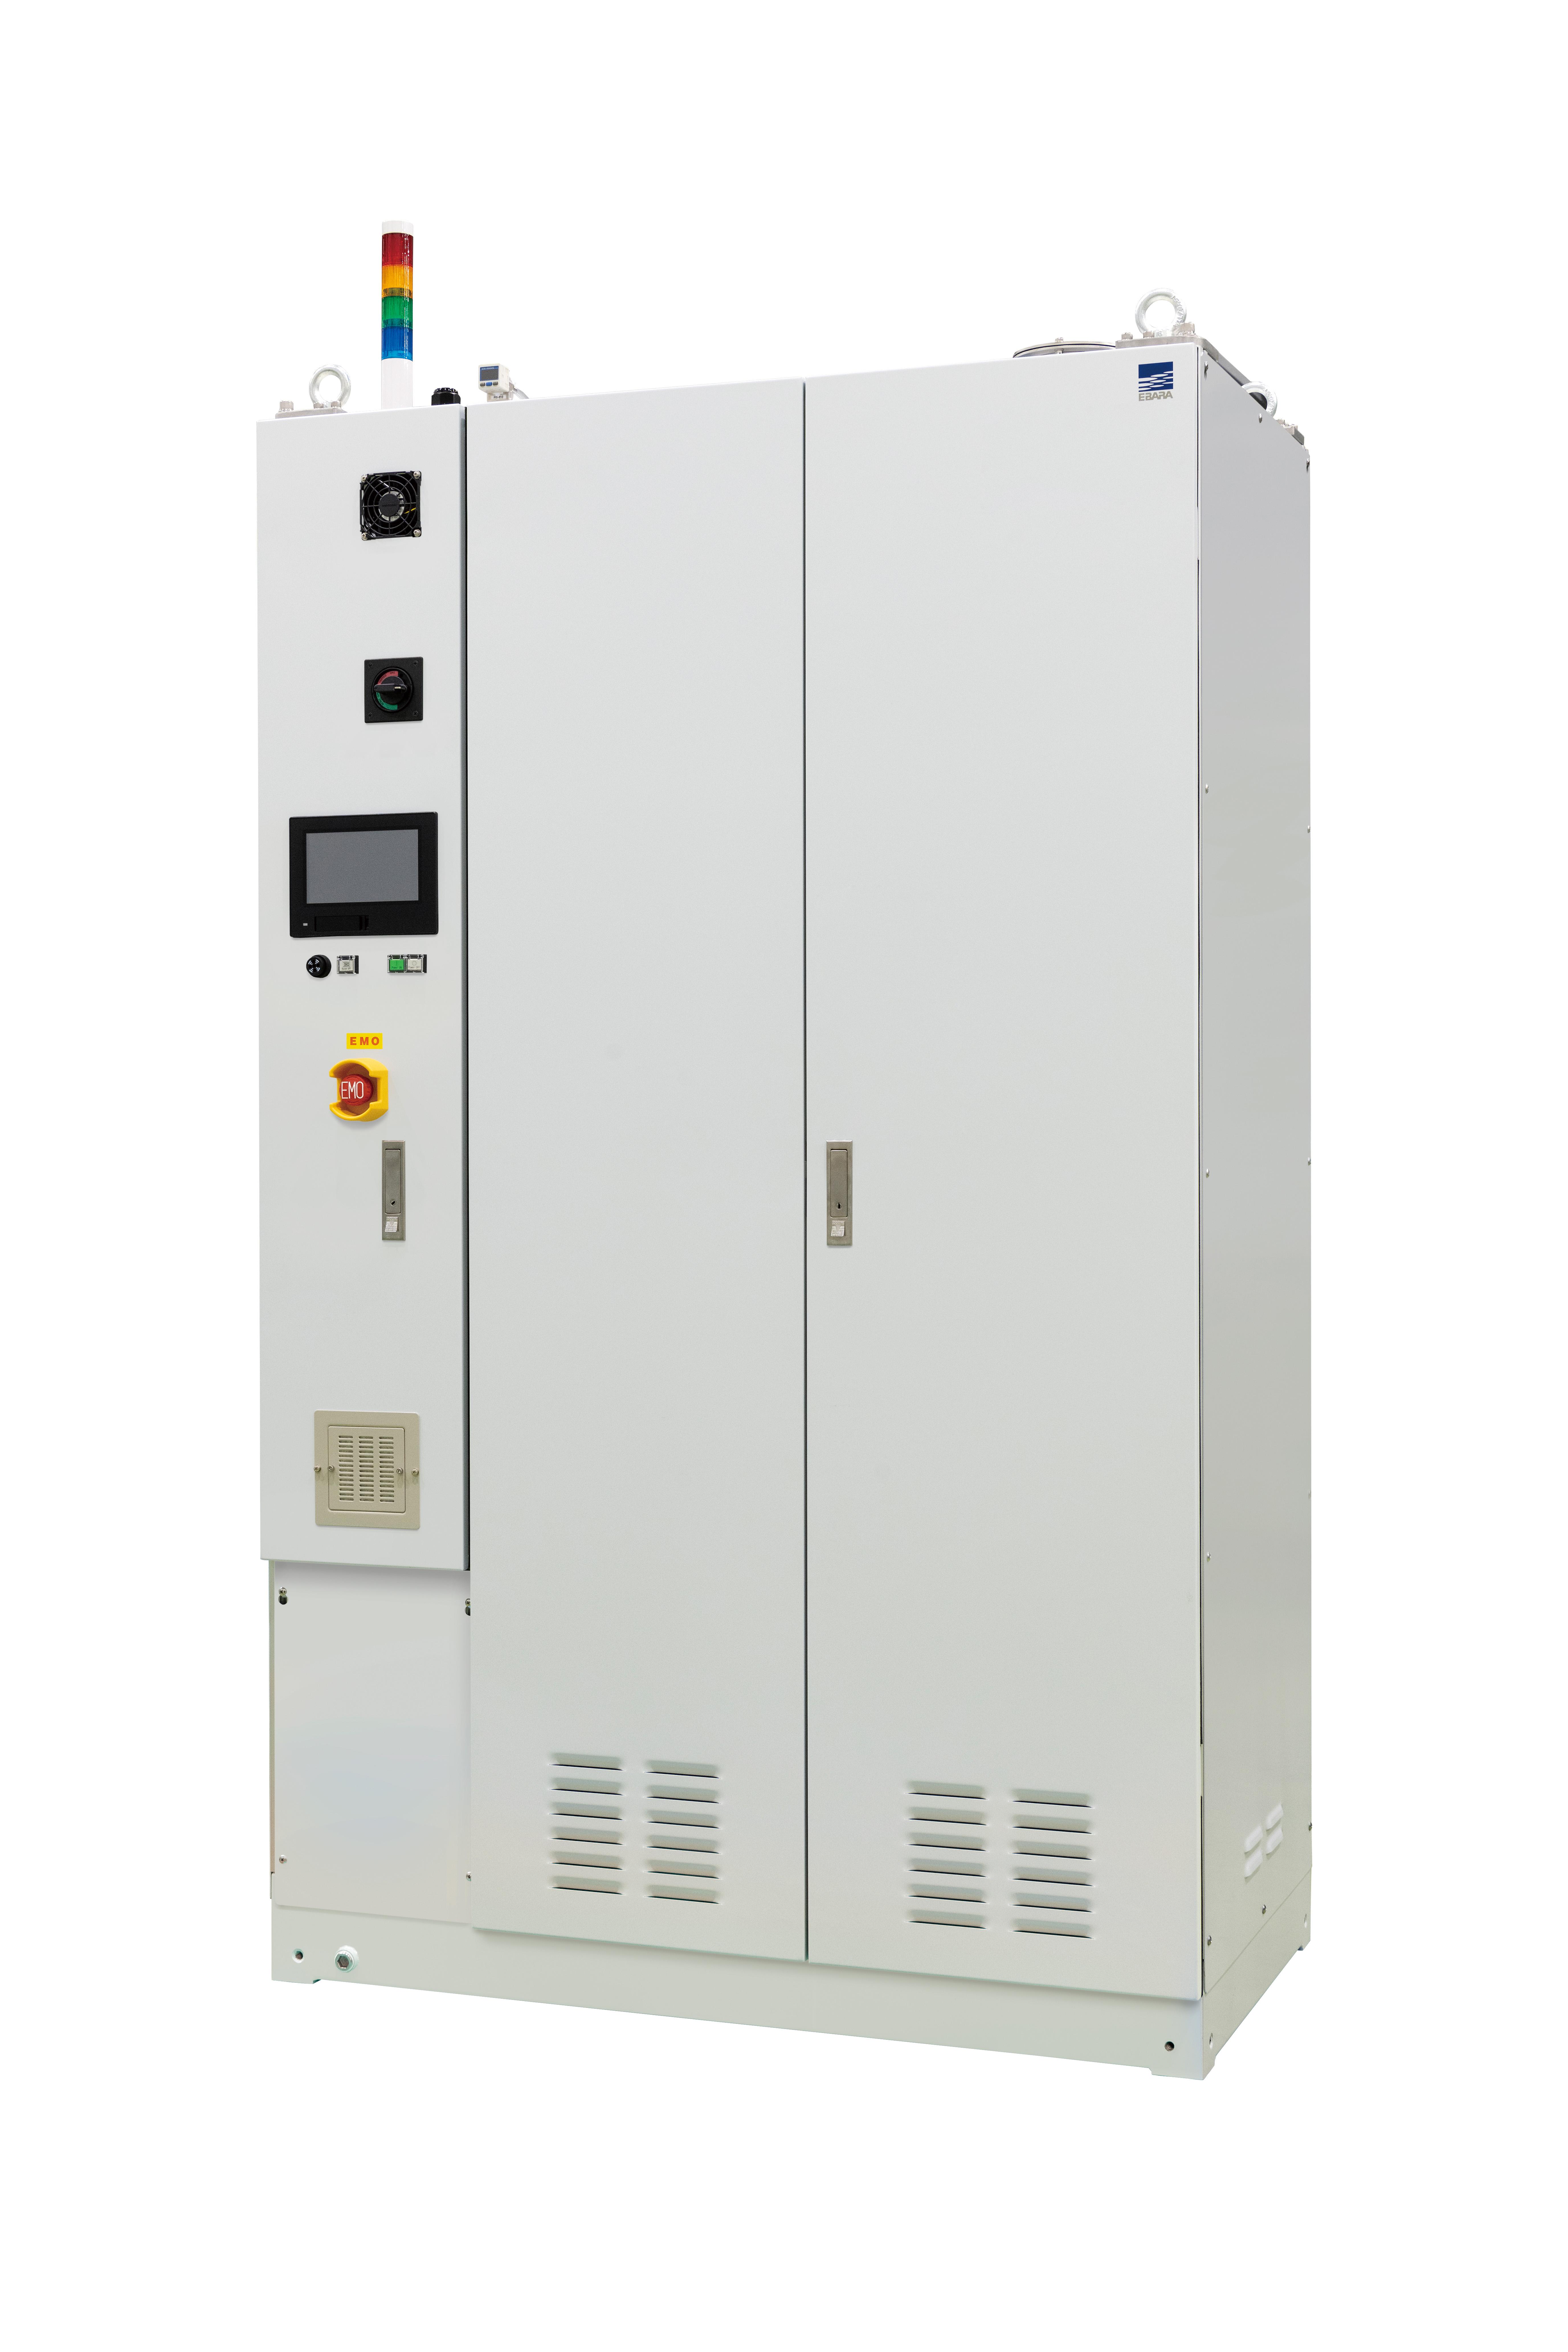 Gas abatement system